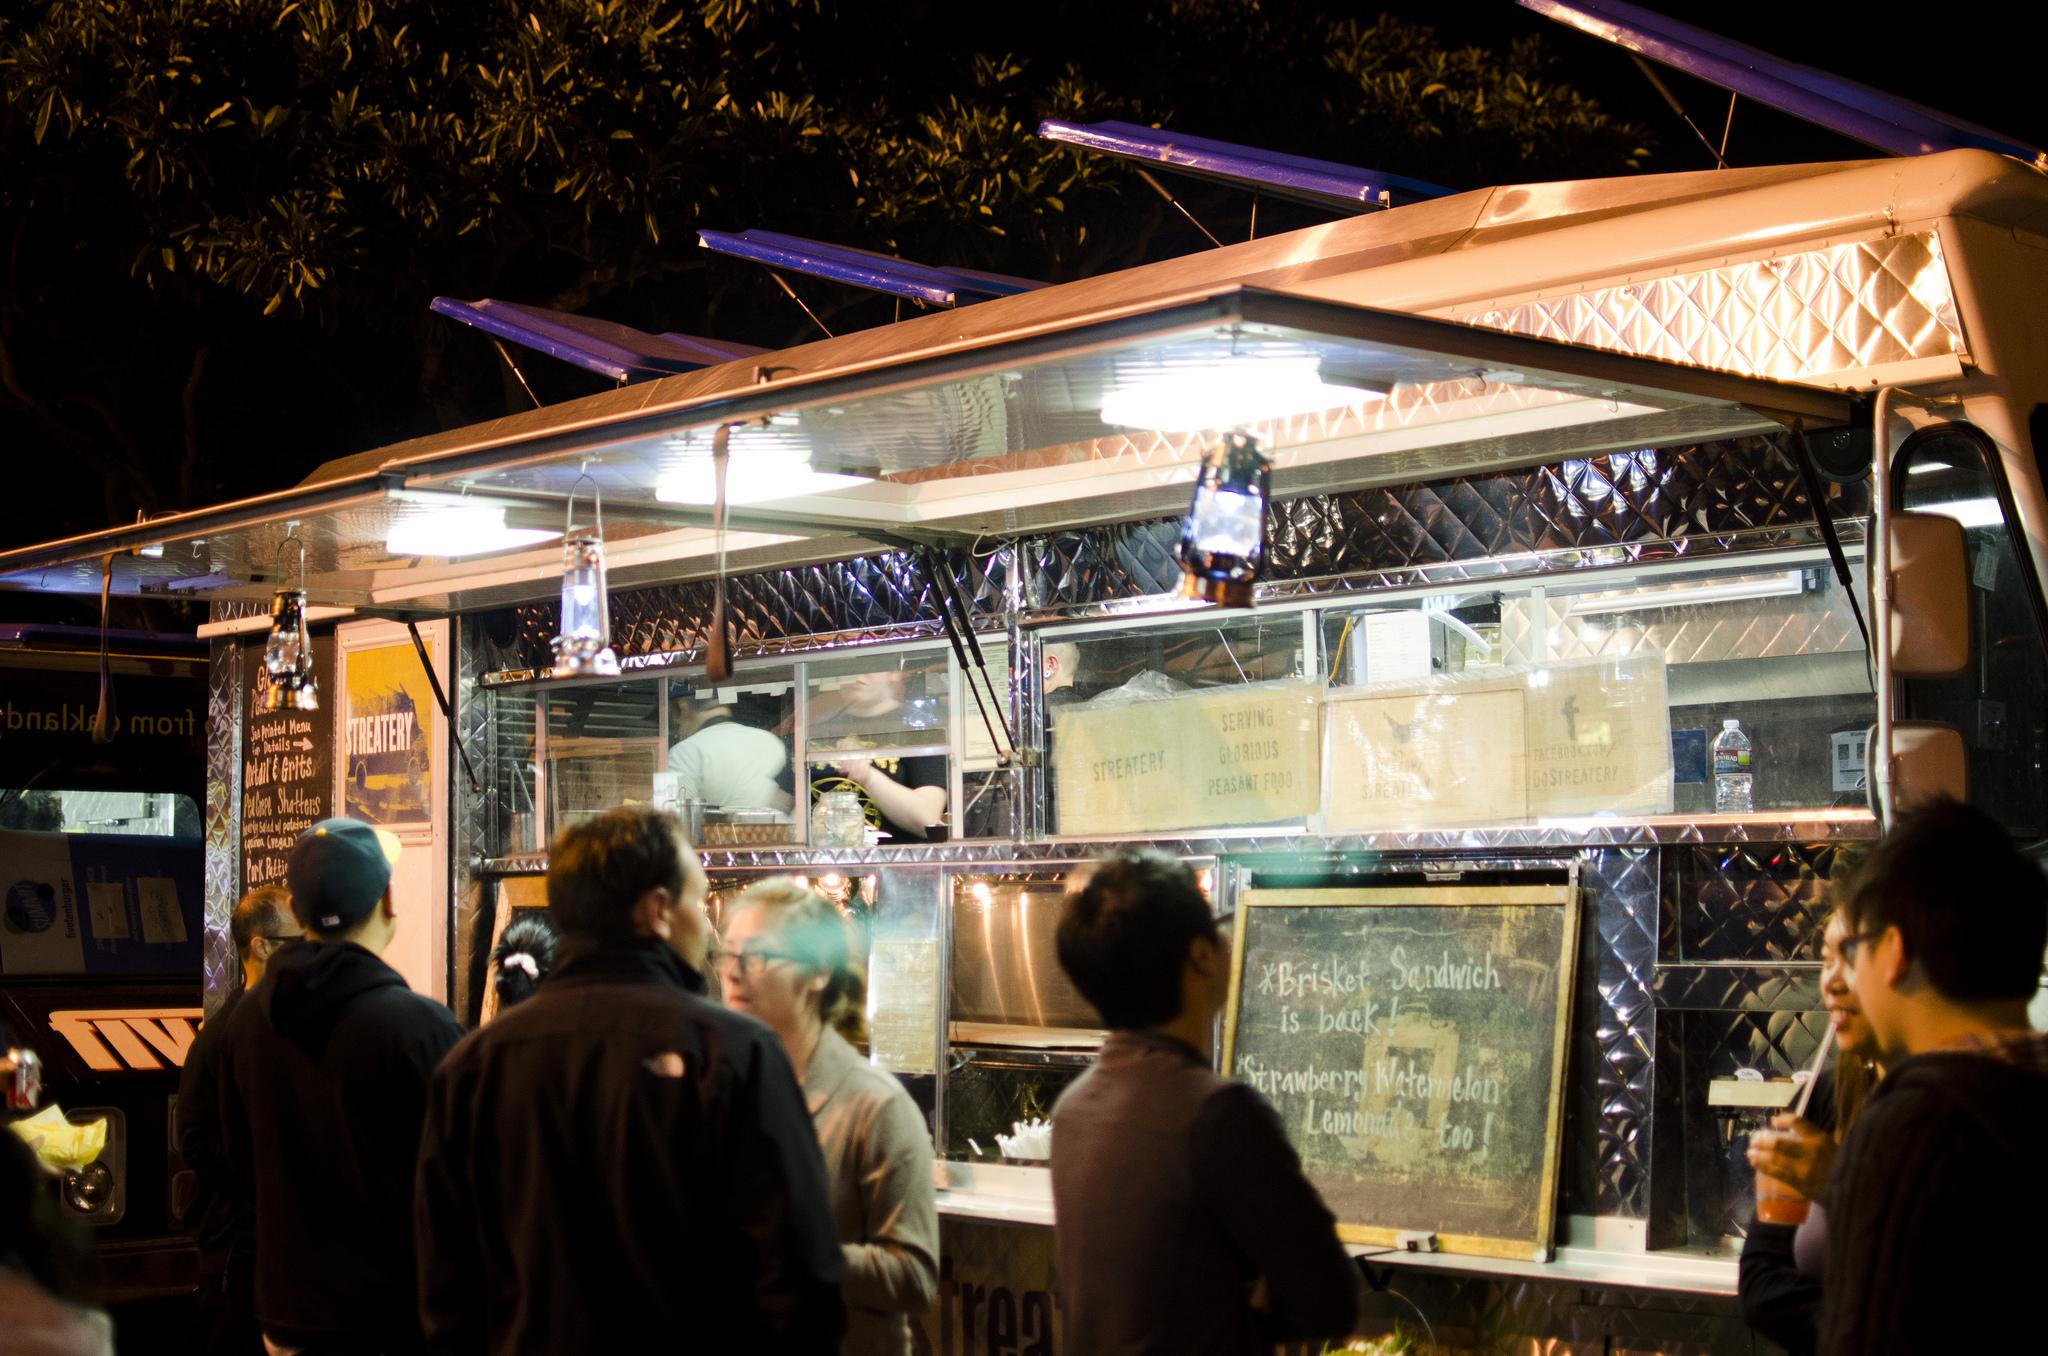 Food trucks in SF